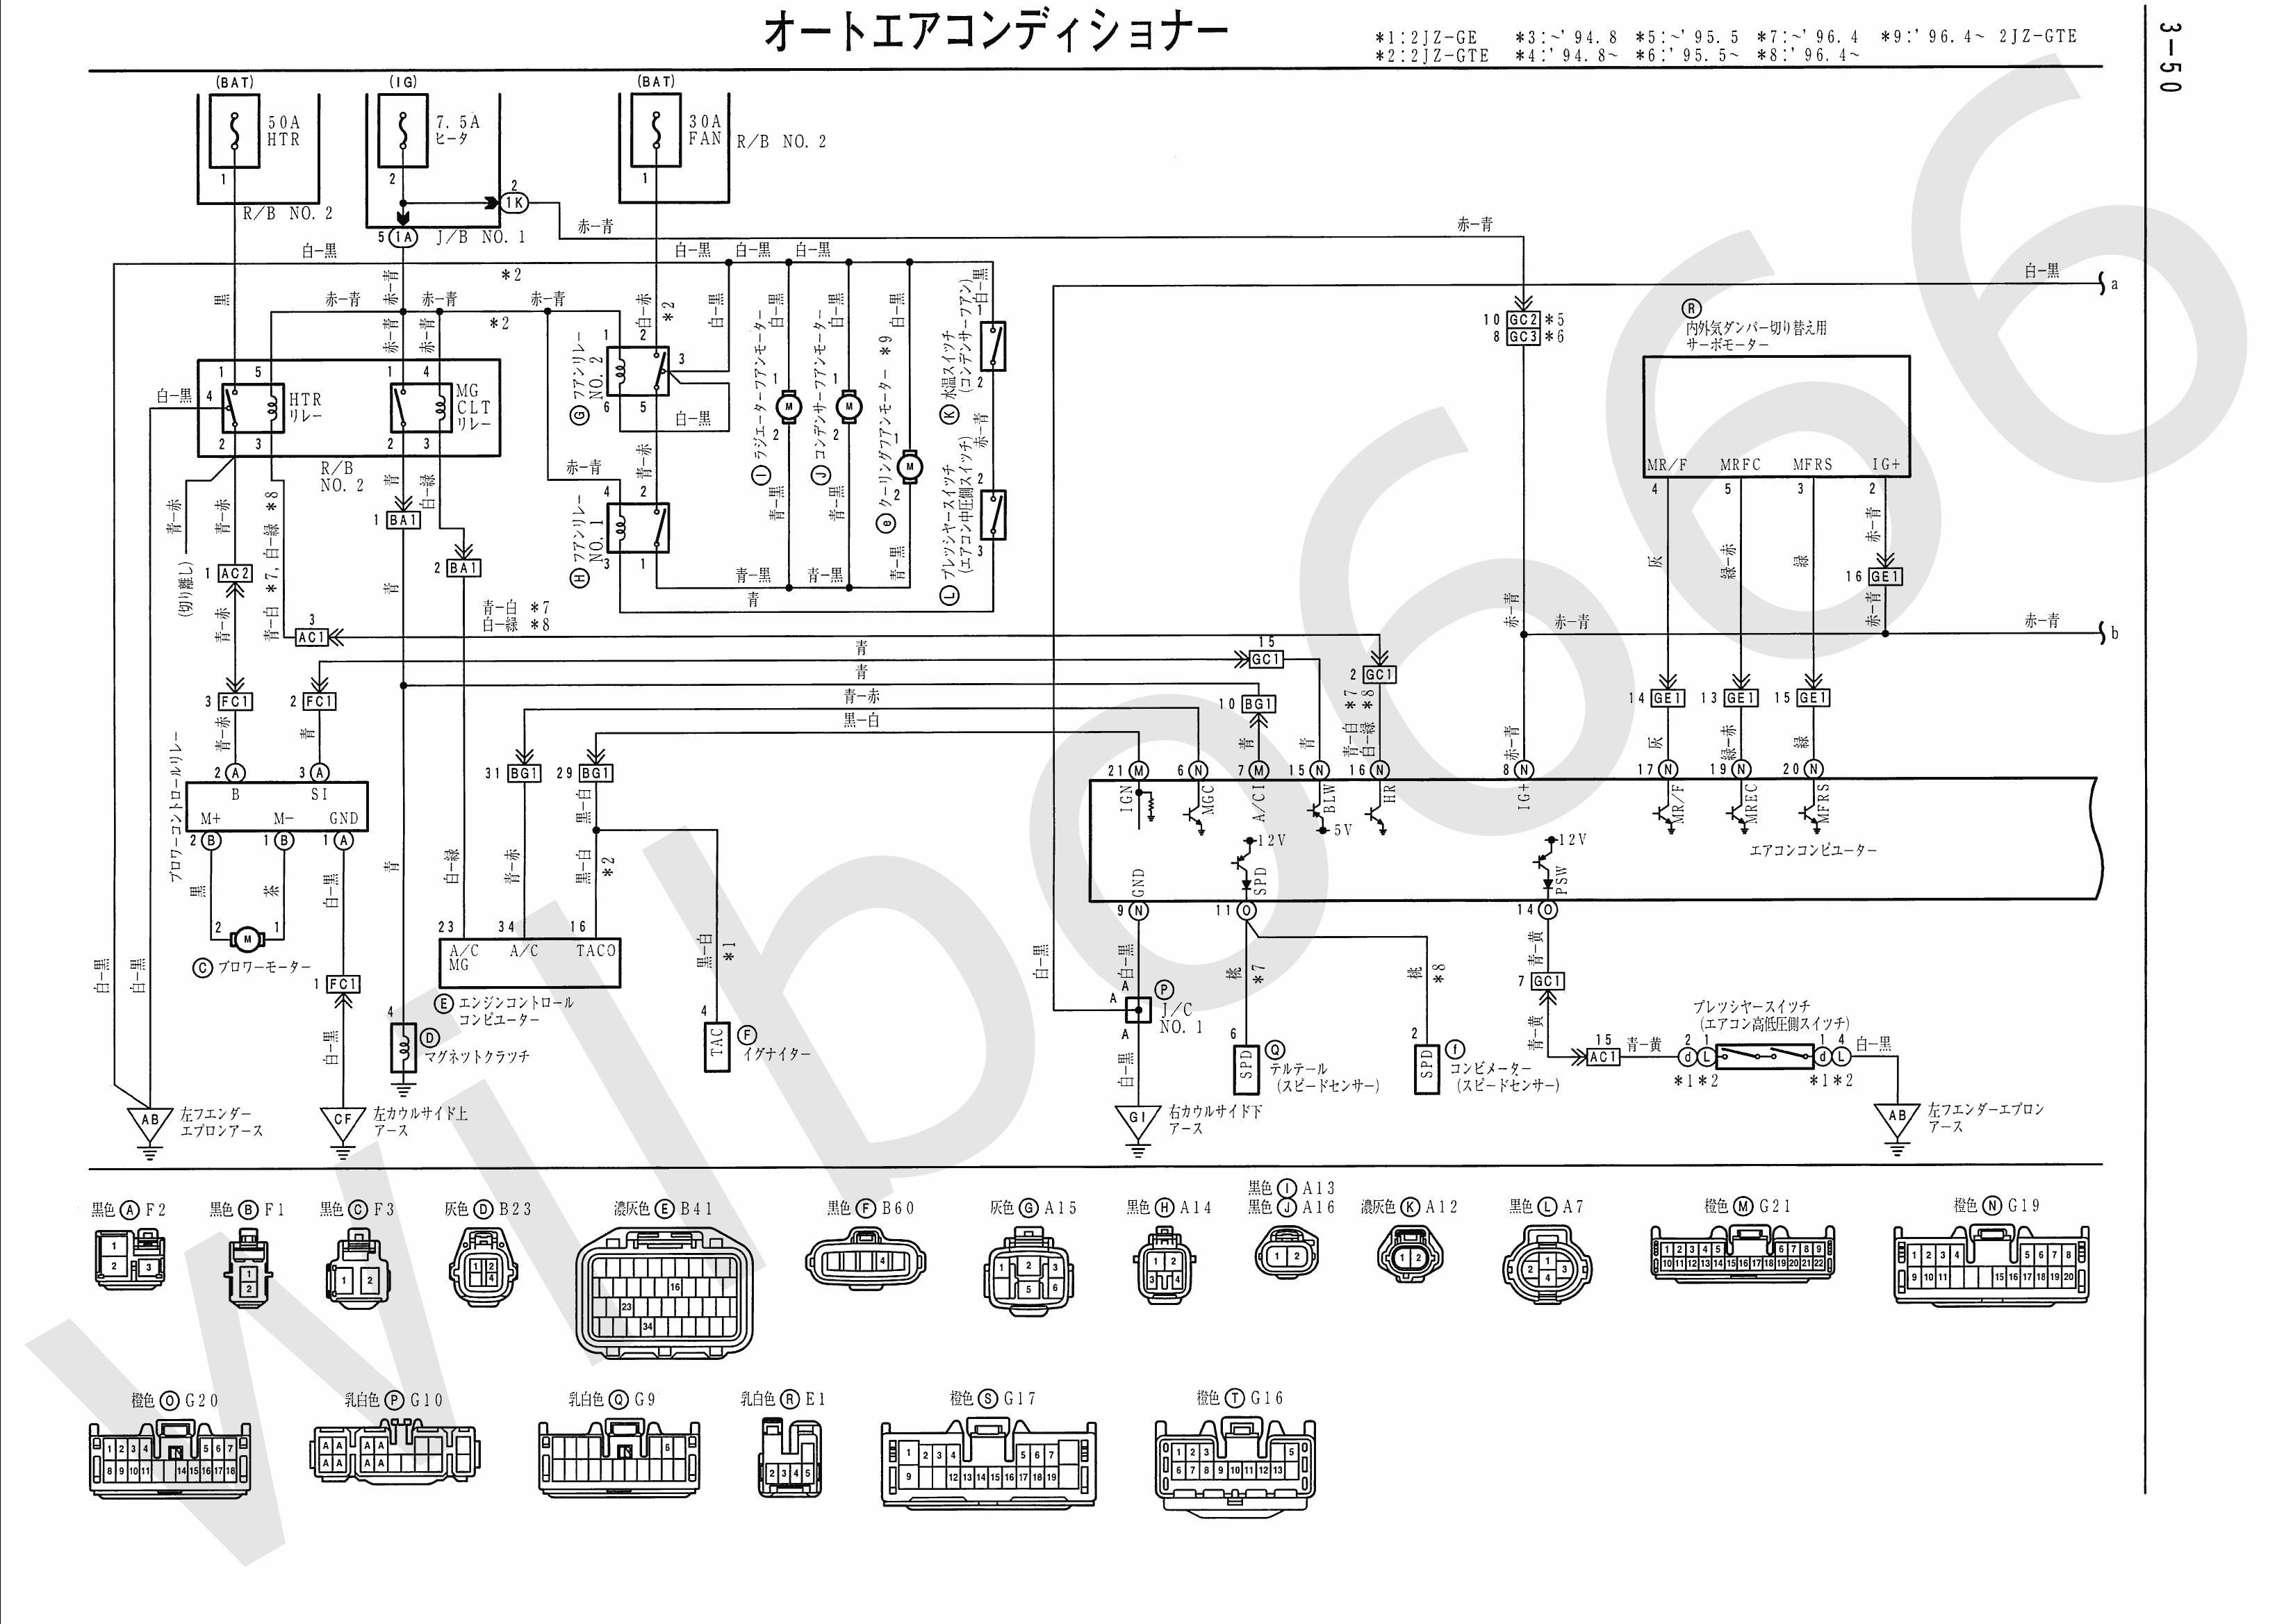 obd1 alternator wire diagram 4 wiring library 351 Cleveland Wiring Diagram obd1 alternator wire diagram 4